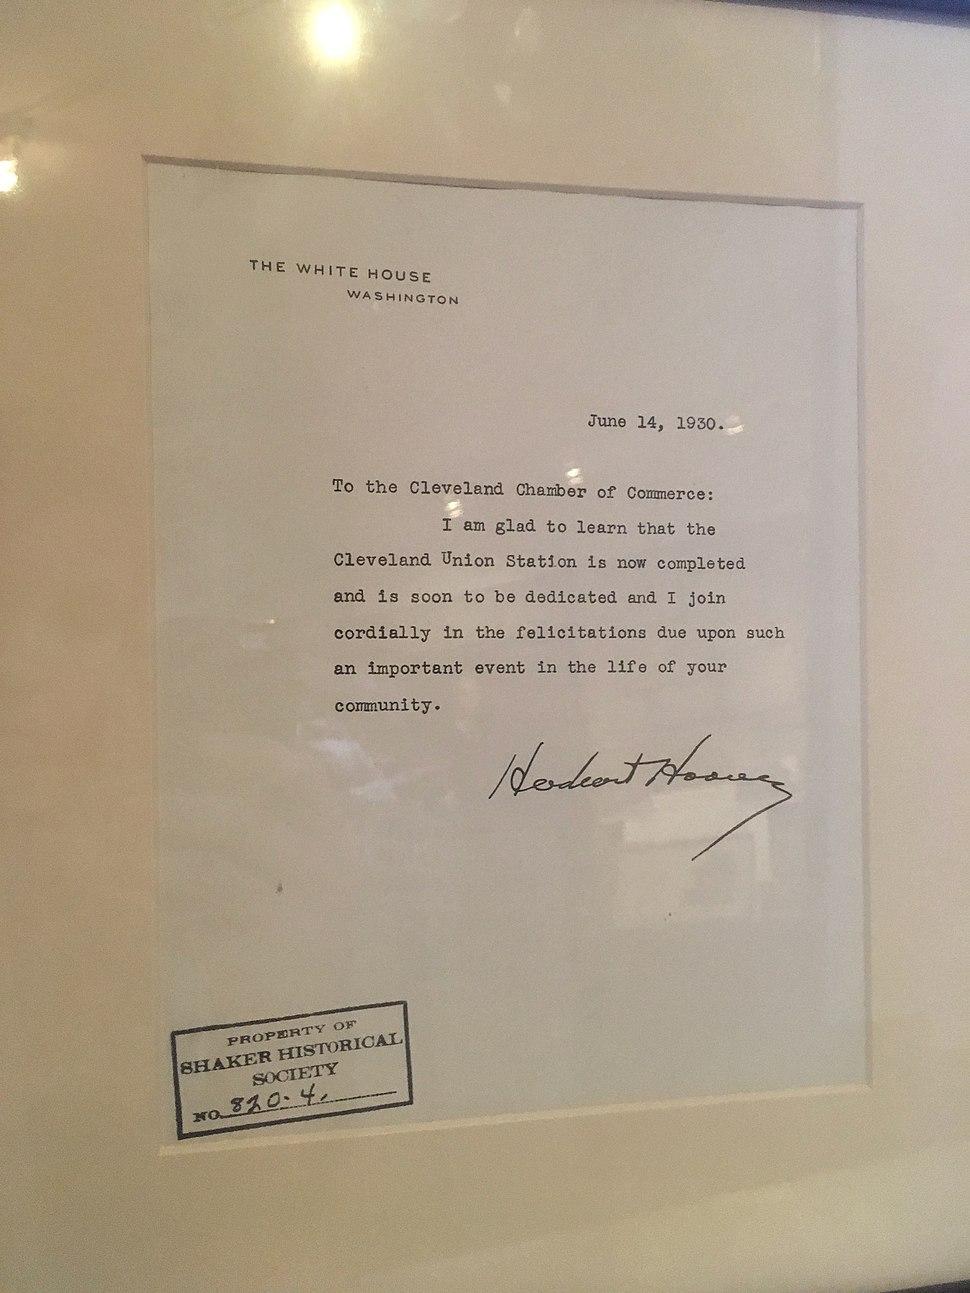 Herbert Hoover letter to Cleveland Chamber of Commerce